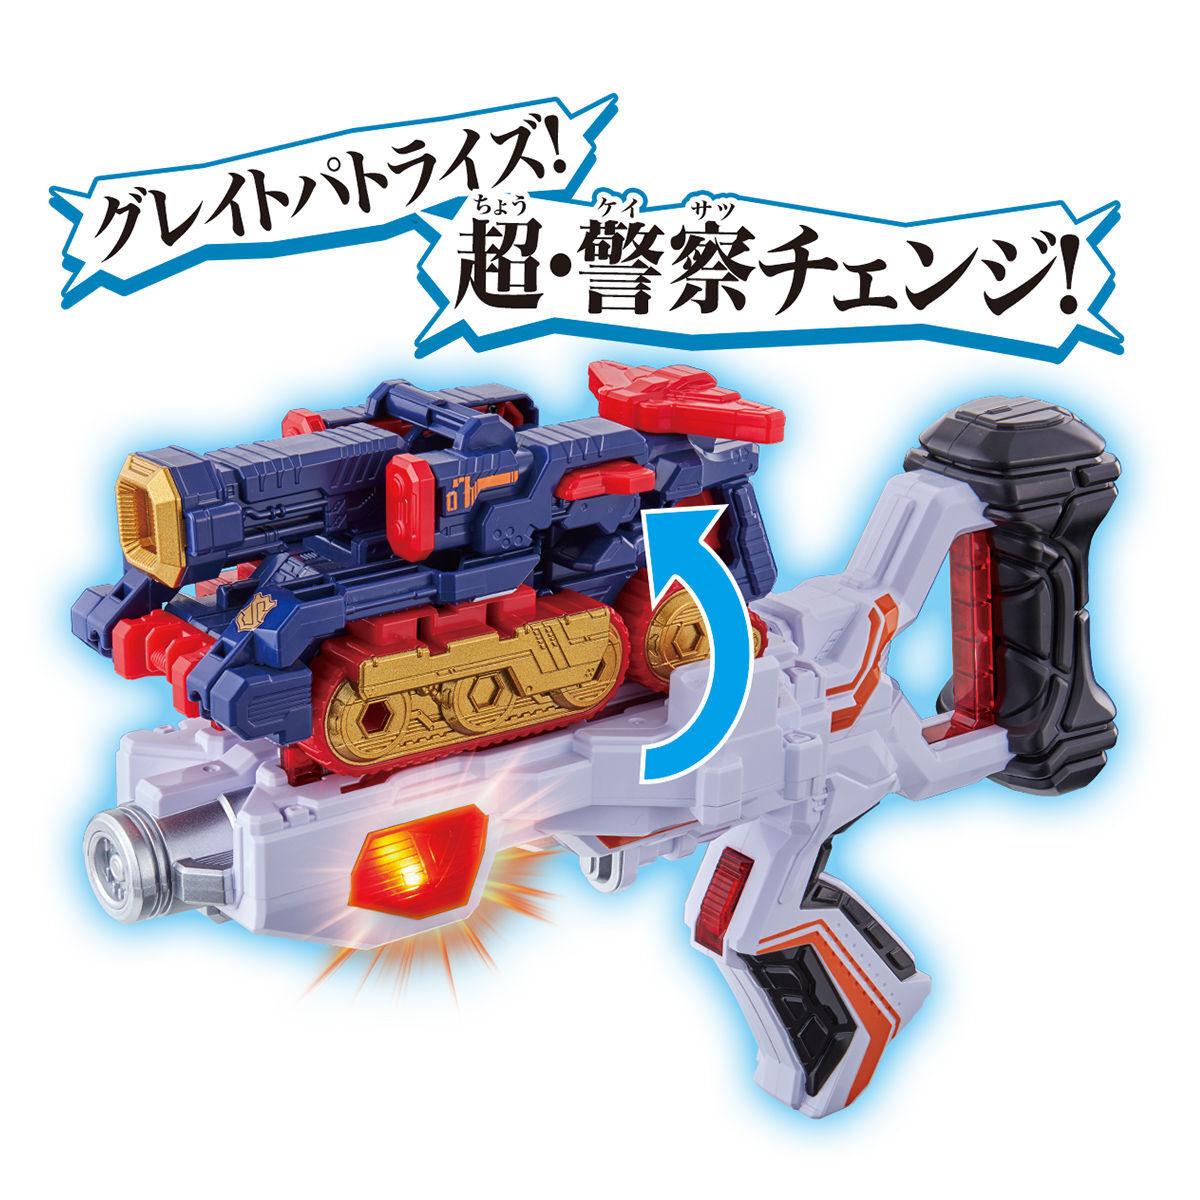 NEW Bandai Lupinranger Lupinranger Lupinranger VS Patranger VS Vehicle series DX siren Striker Figure dedaba